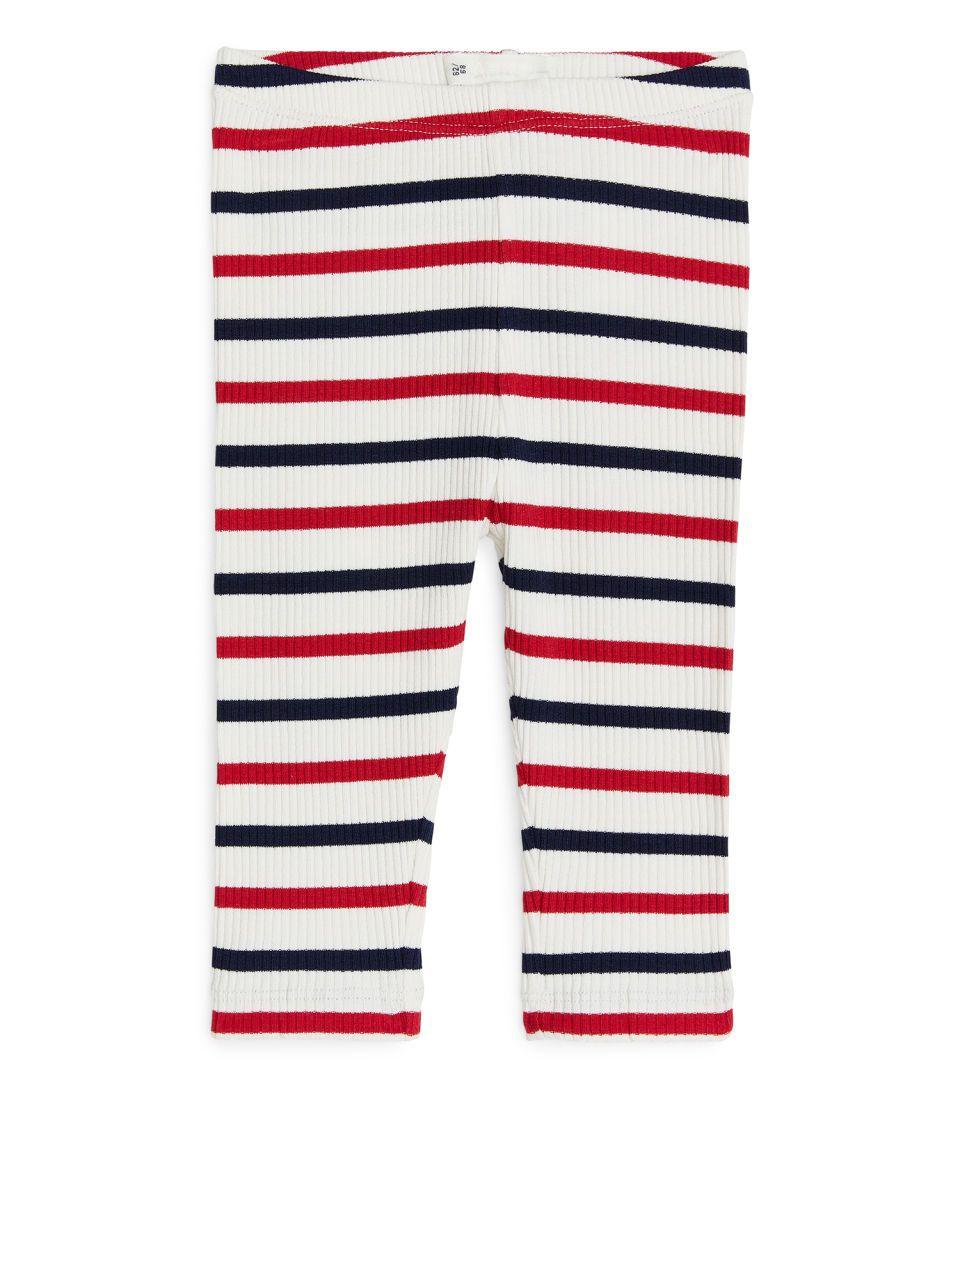 d7043ddd1f5dd8 Ribbed Leggings - Off White/Red/Blue - Baby & Newborn | Bäbi | Baby ...